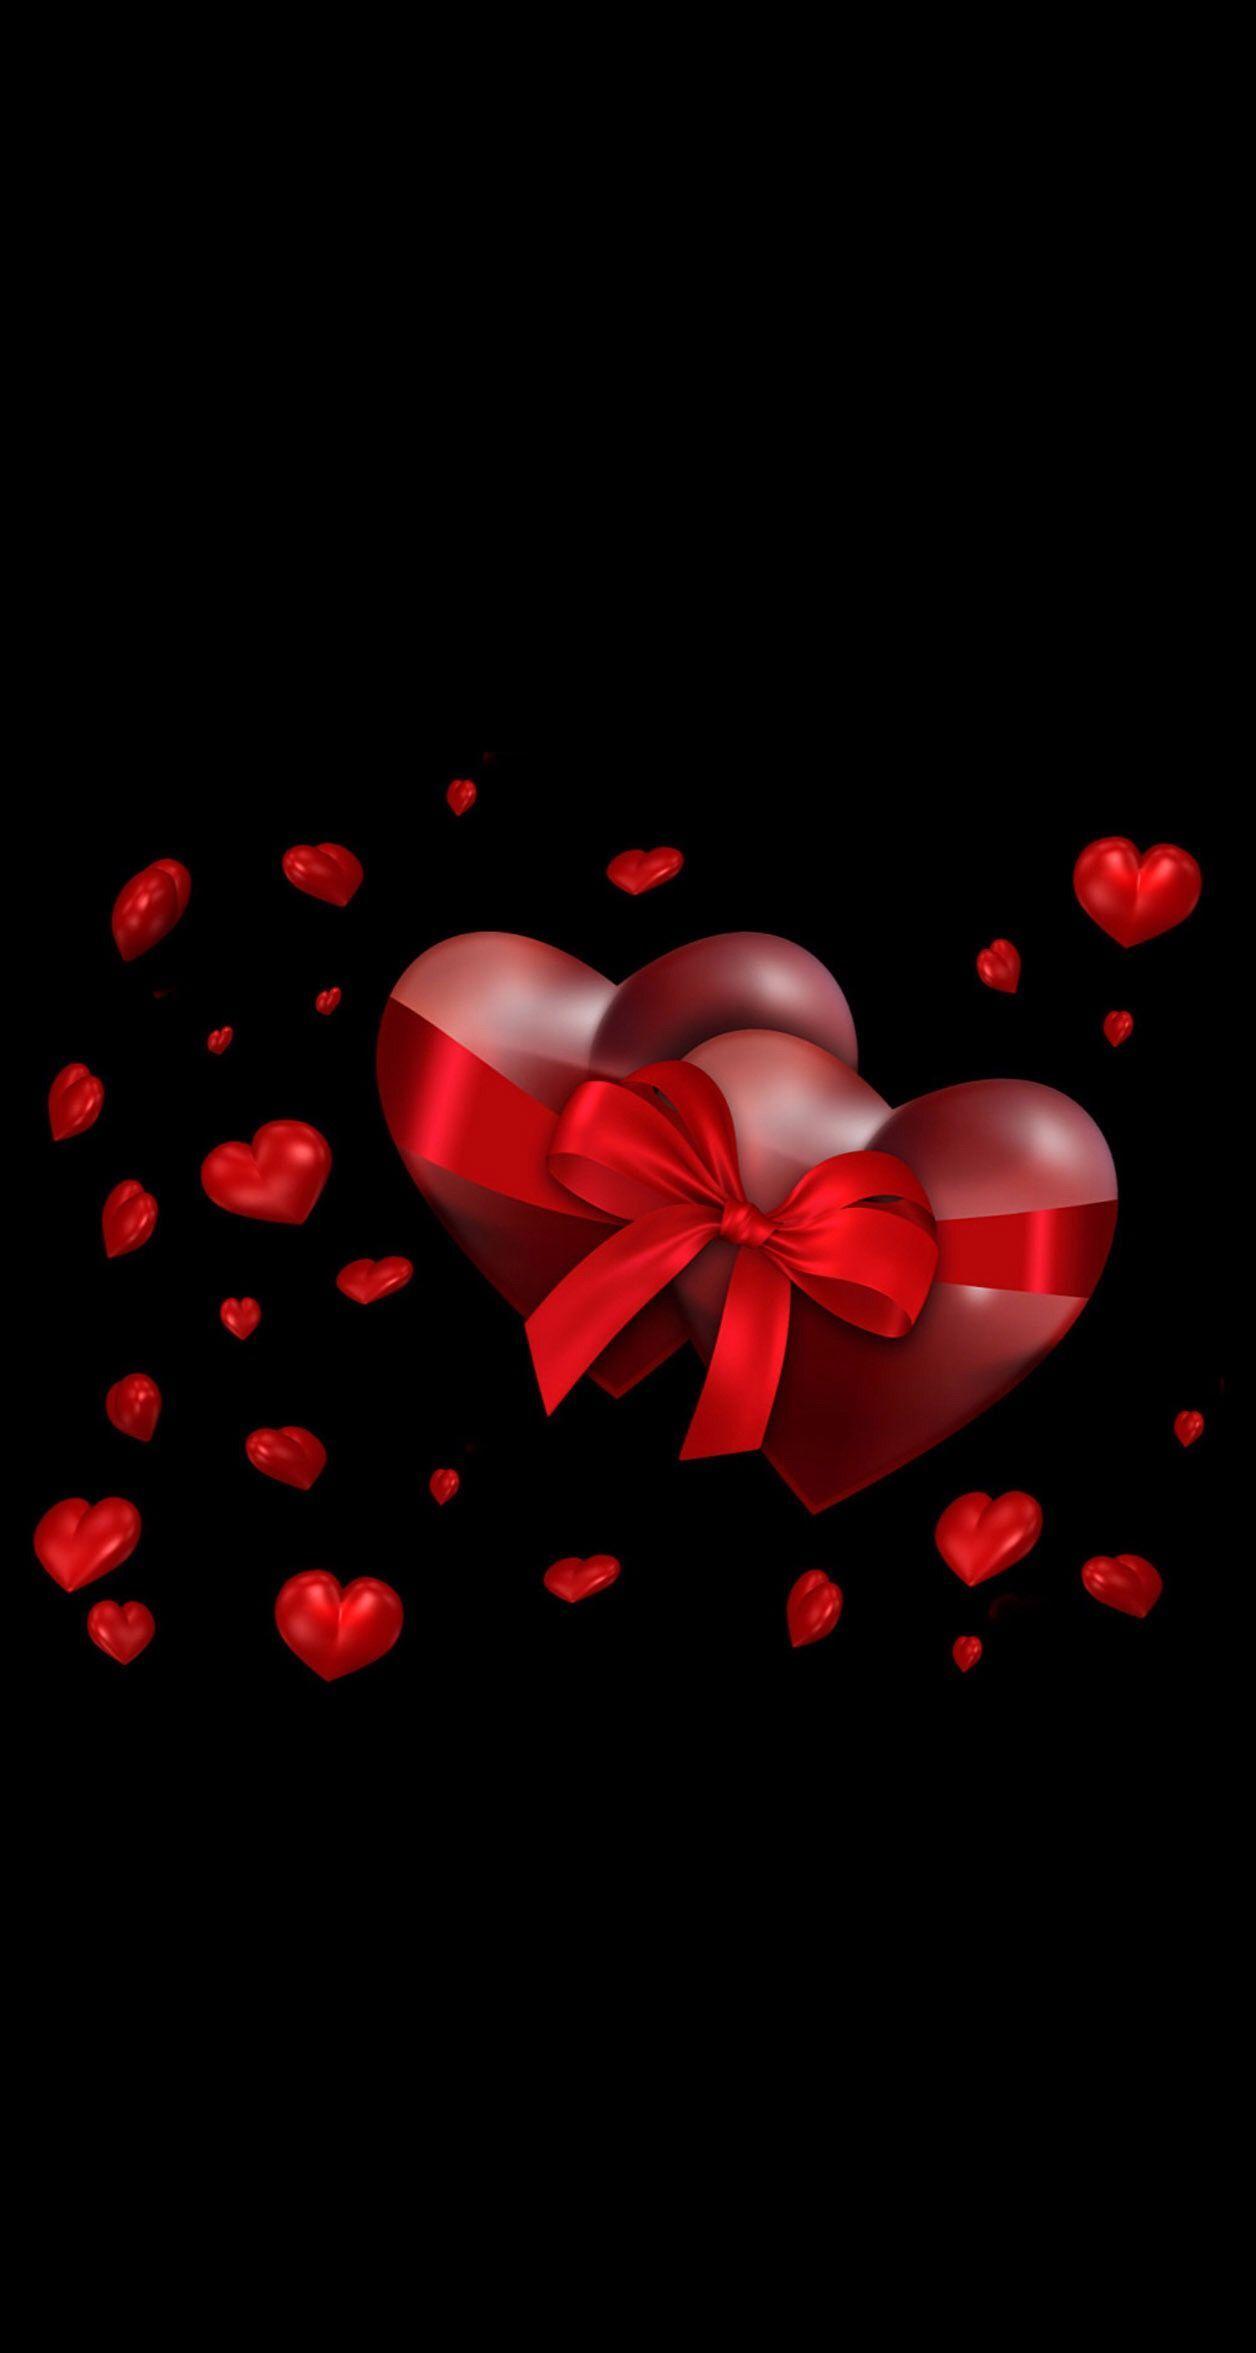 full of heart - Salvabrani